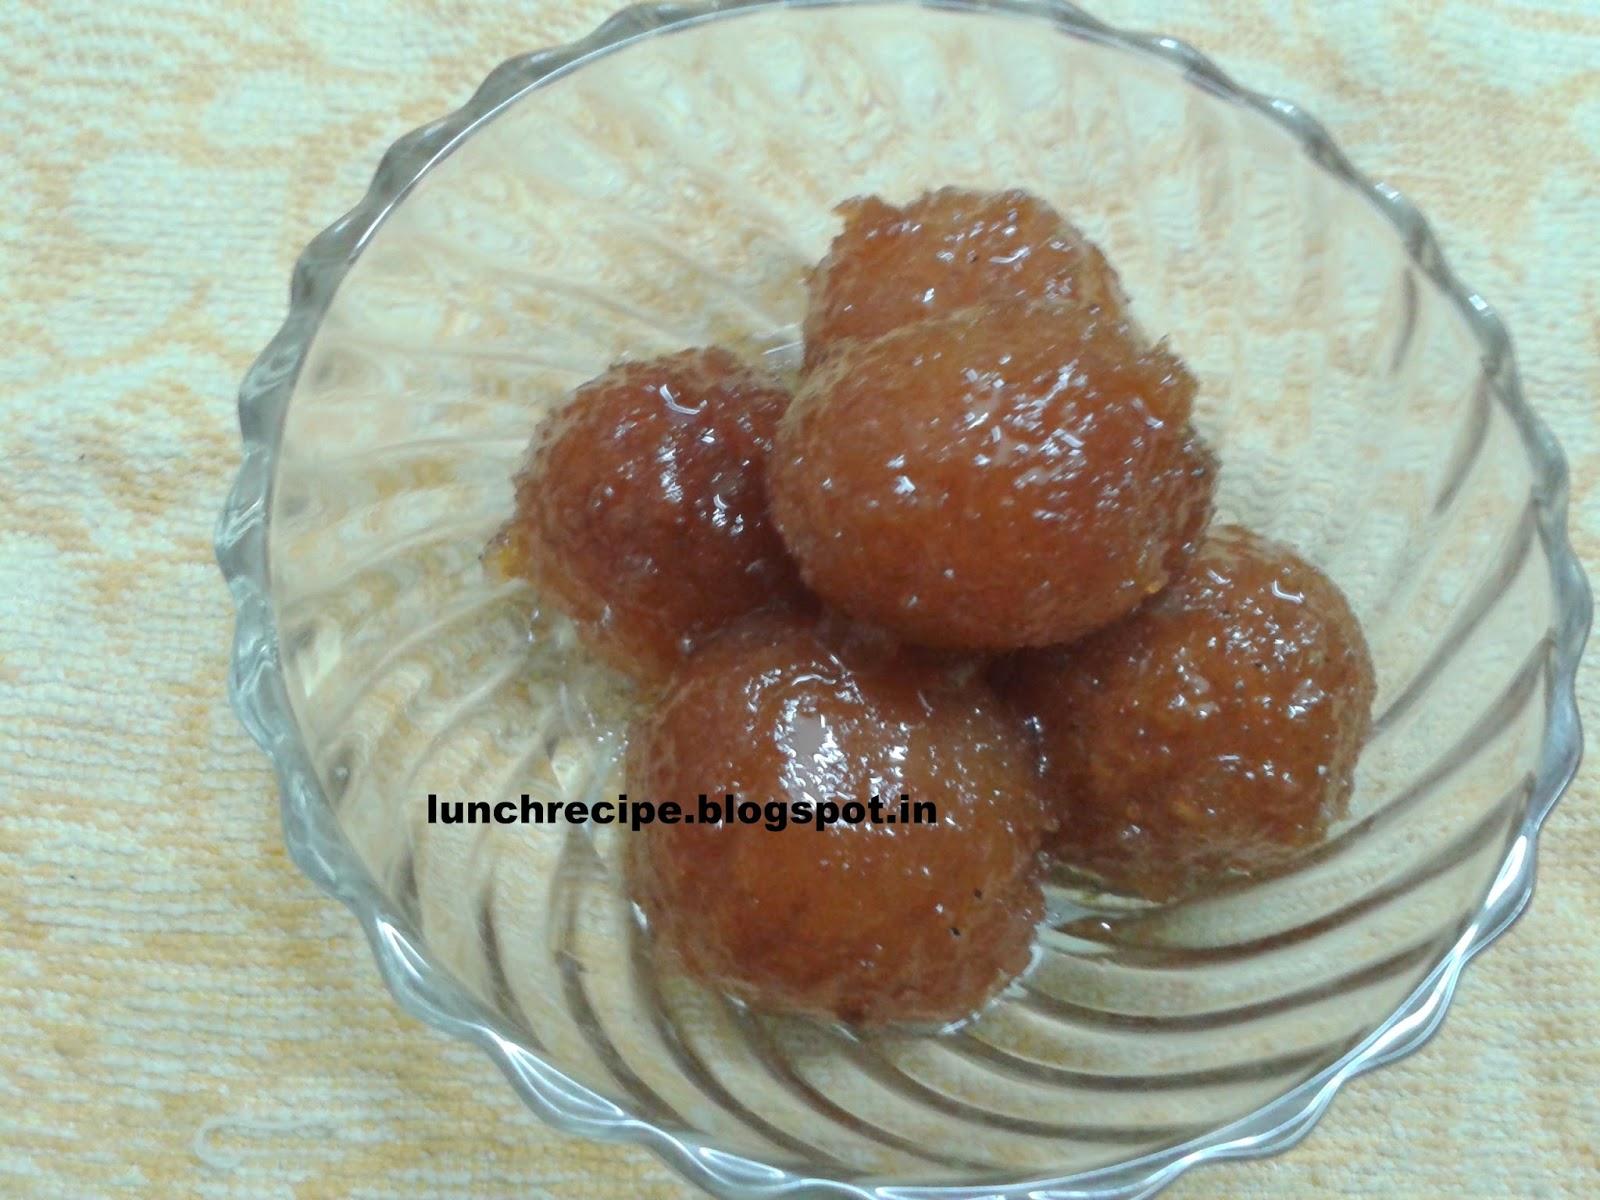 How to make Gulab Jamun | गुलाब जामुन  - Gulab Jamun